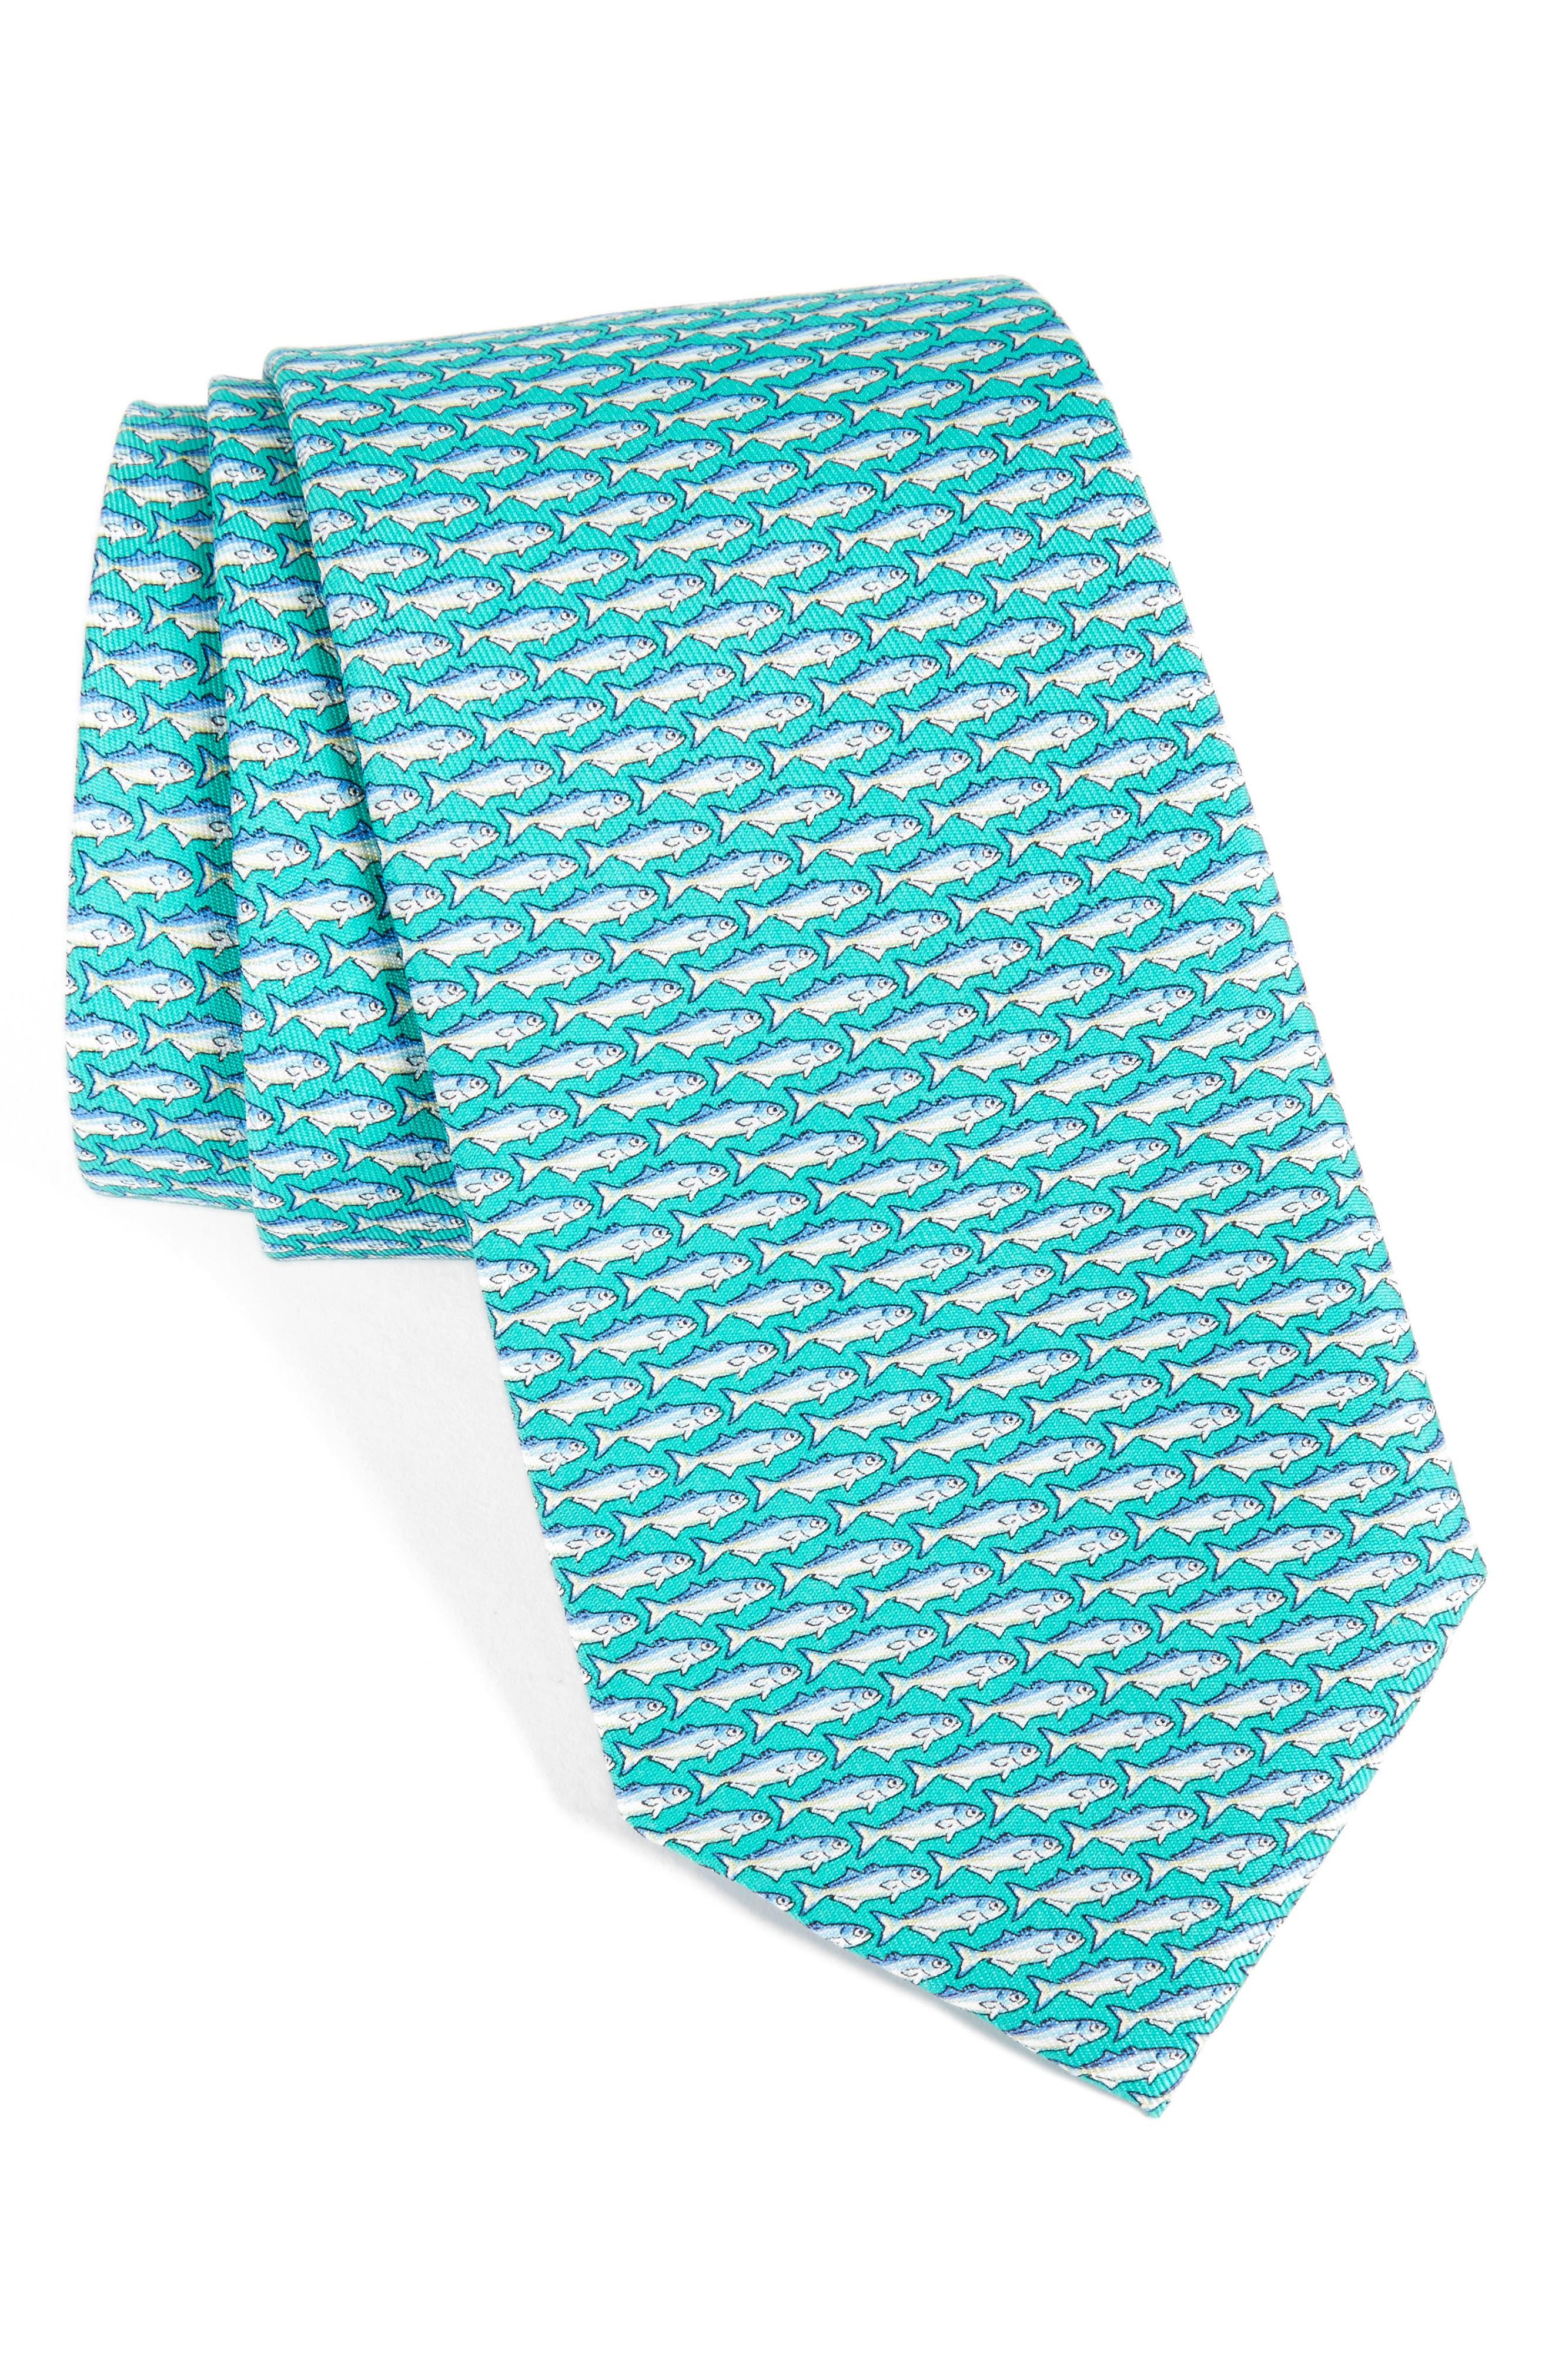 Blue Fish Print Silk Tie,                             Main thumbnail 1, color,                             356